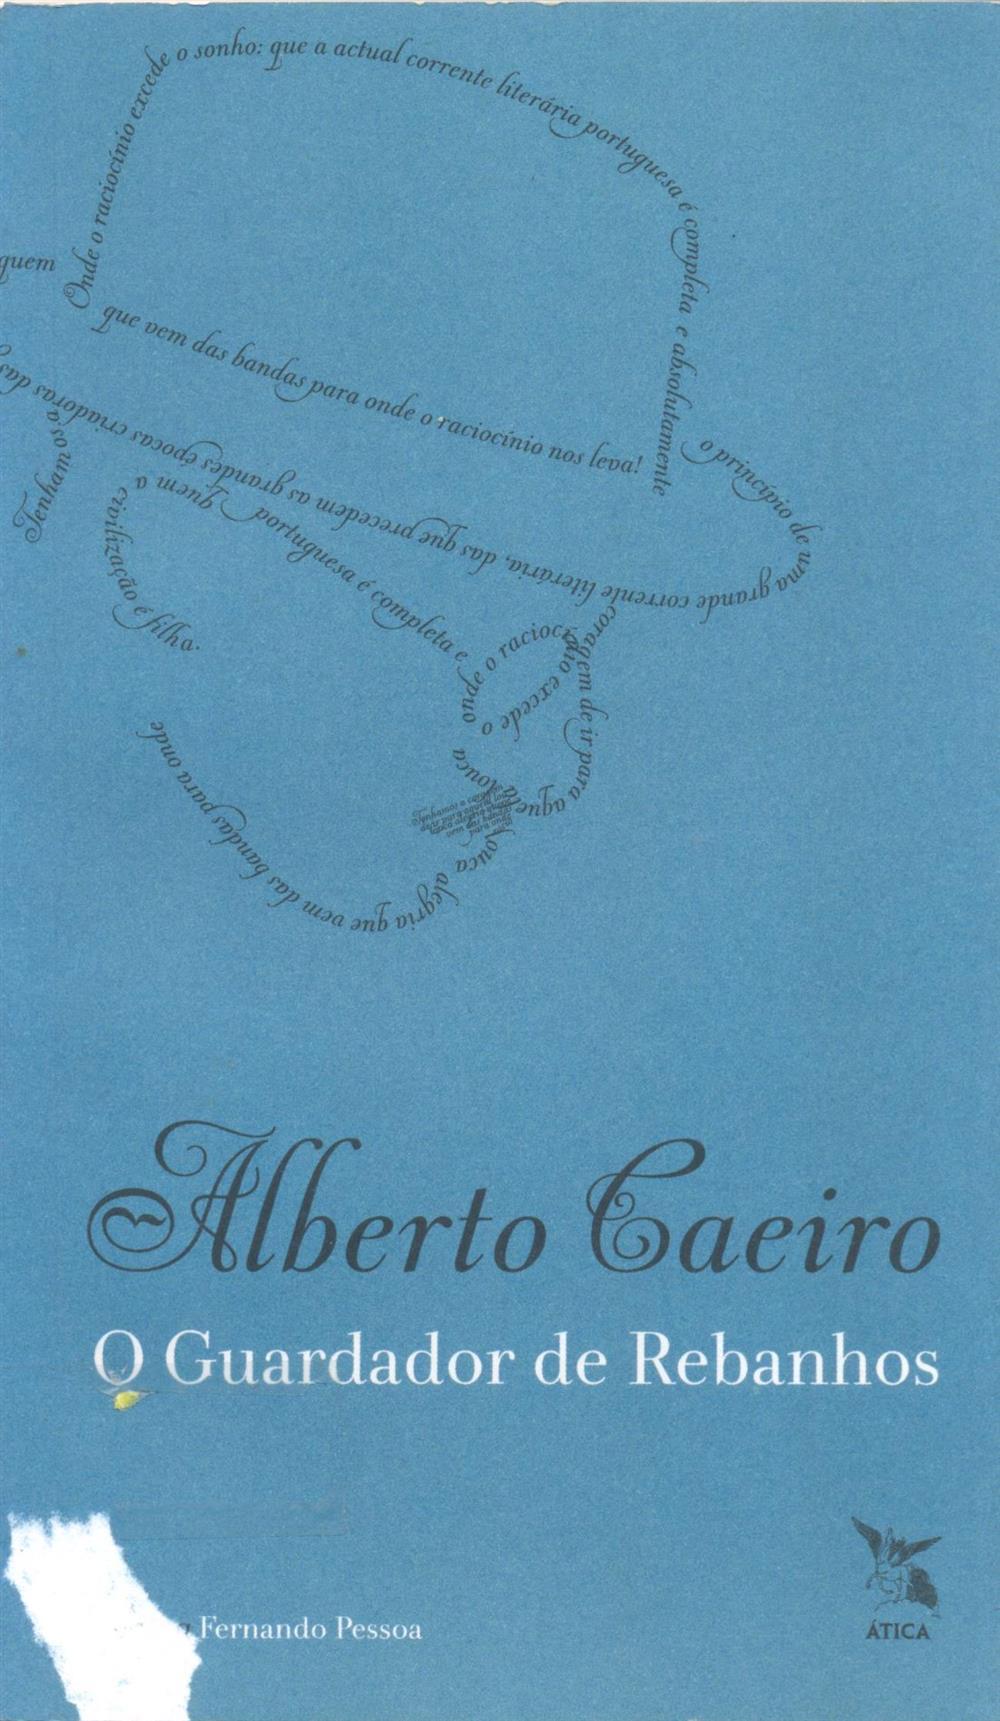 Alberto Caeiro 001.jpg